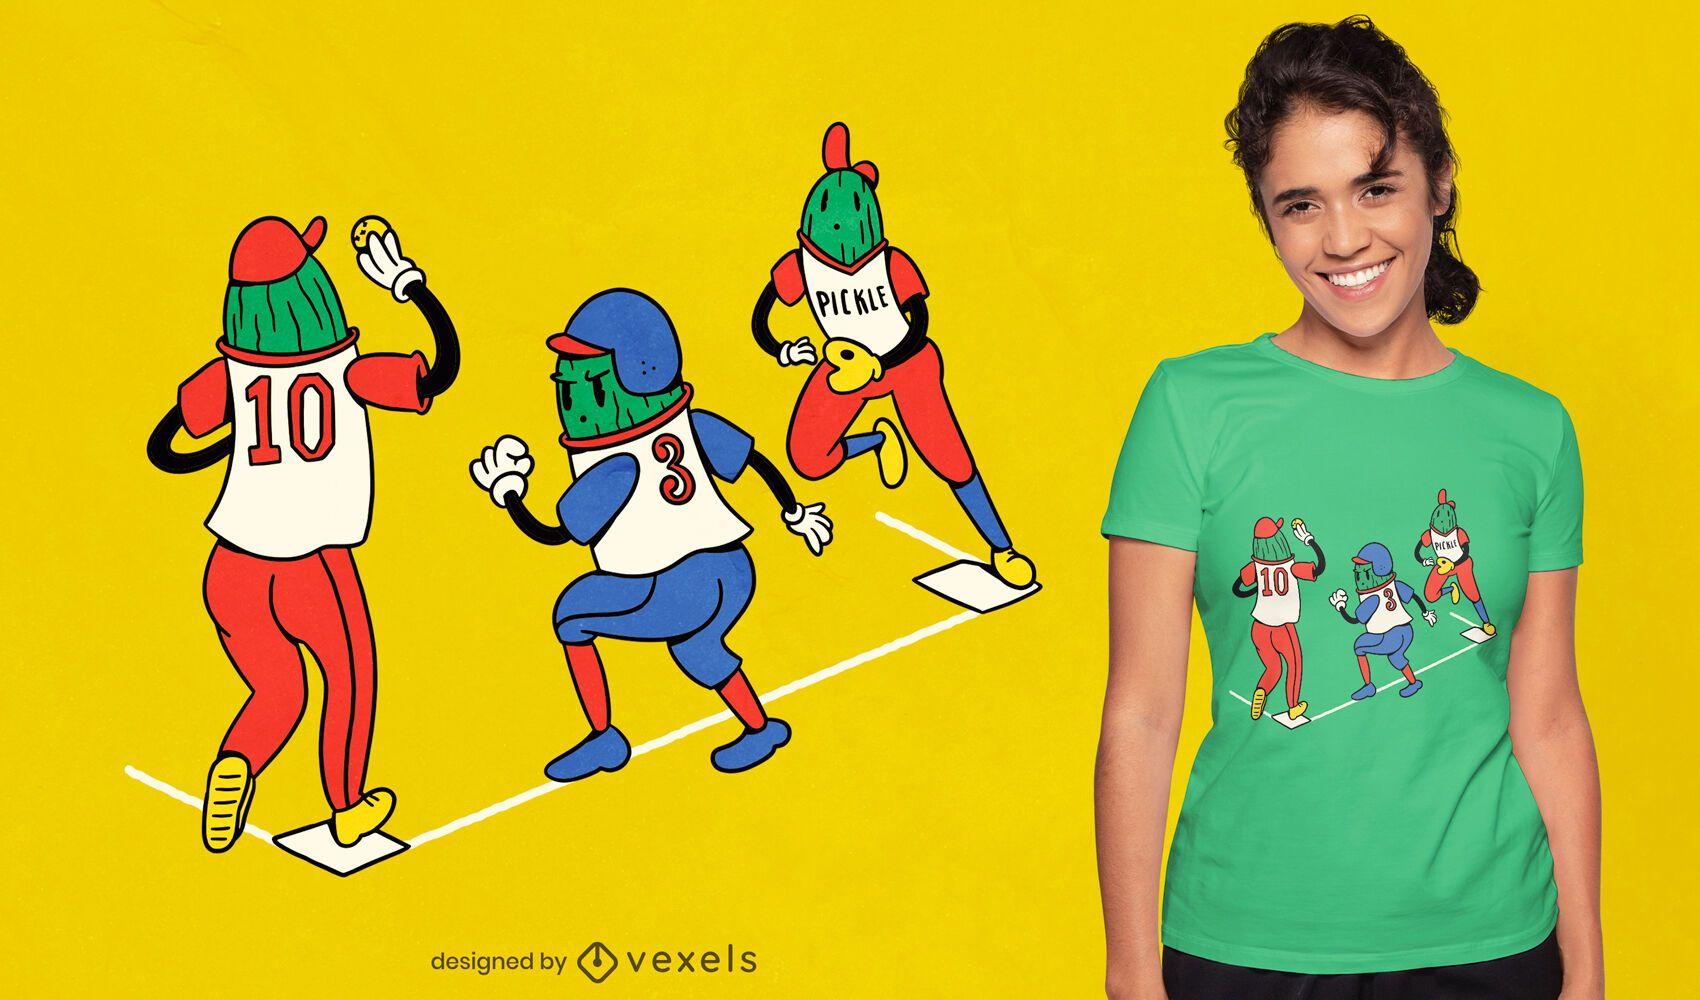 Pickles baseball cartoon t-shirt design